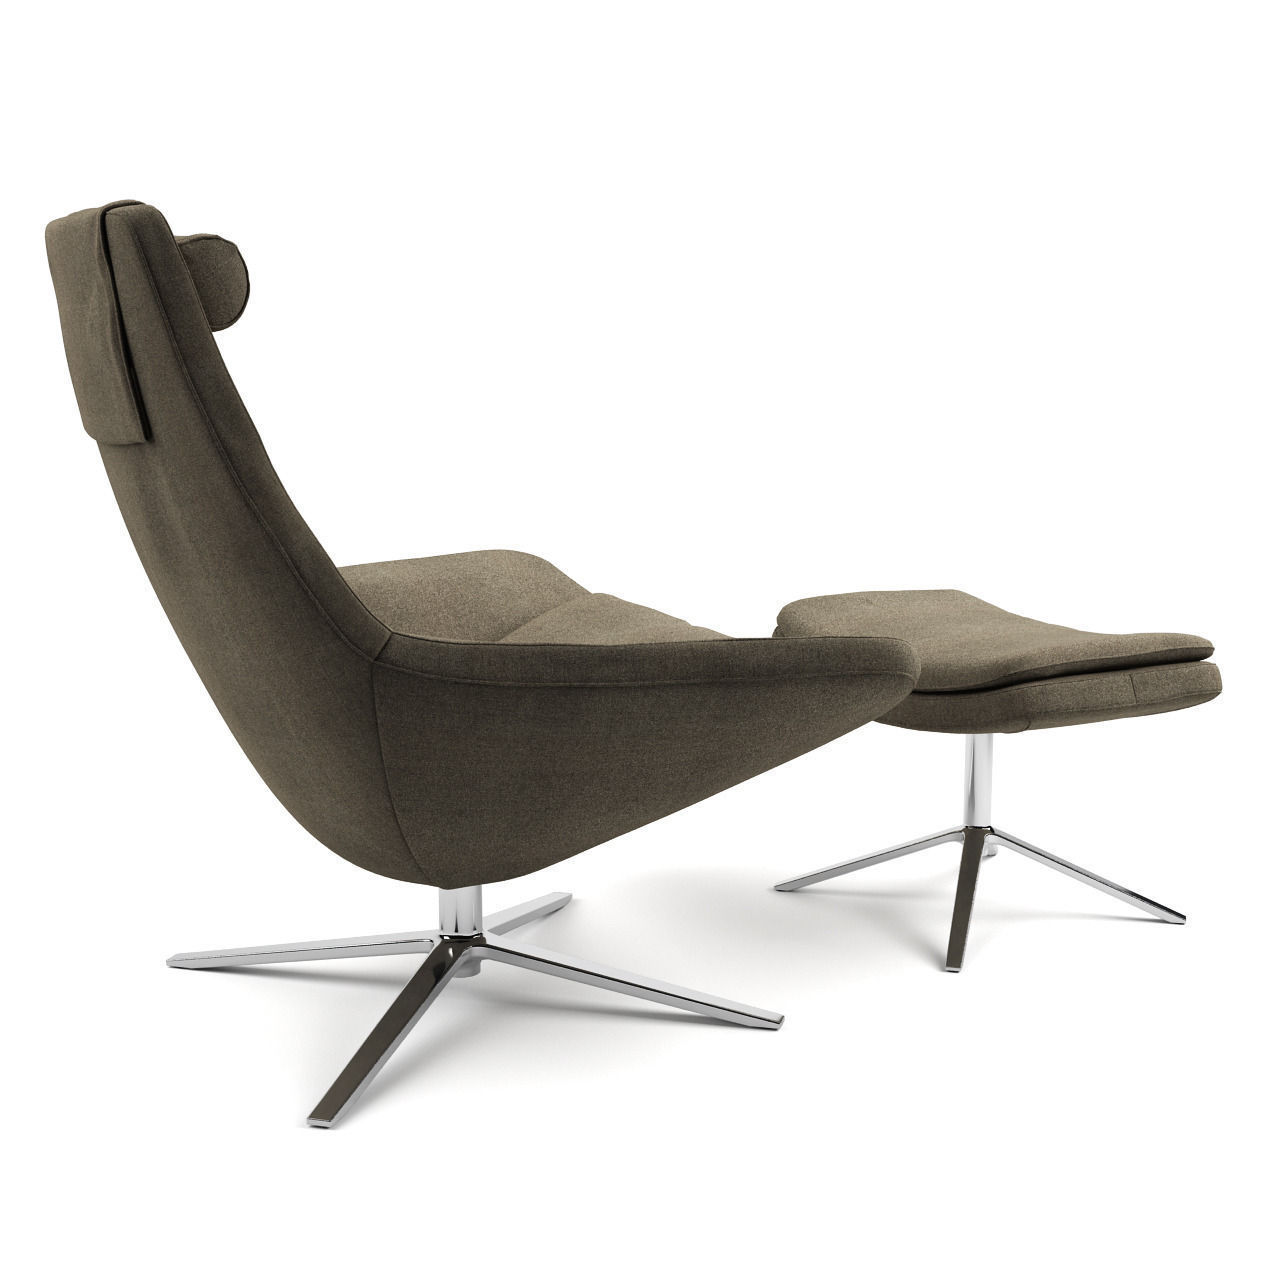 metropolitan armchair by bb italia 3d model max obj fbx. Black Bedroom Furniture Sets. Home Design Ideas